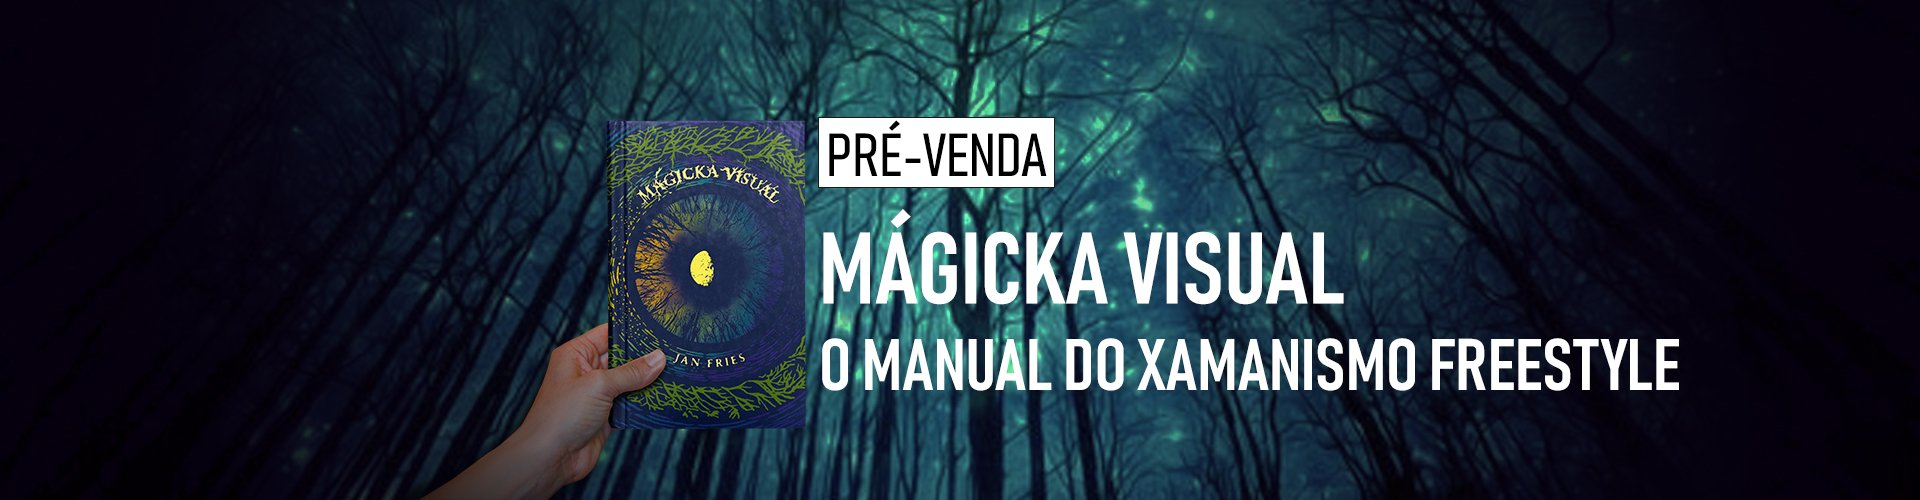 Mágicka Visual – Um Manual de Xamanismo Freestyle - Jan Fries